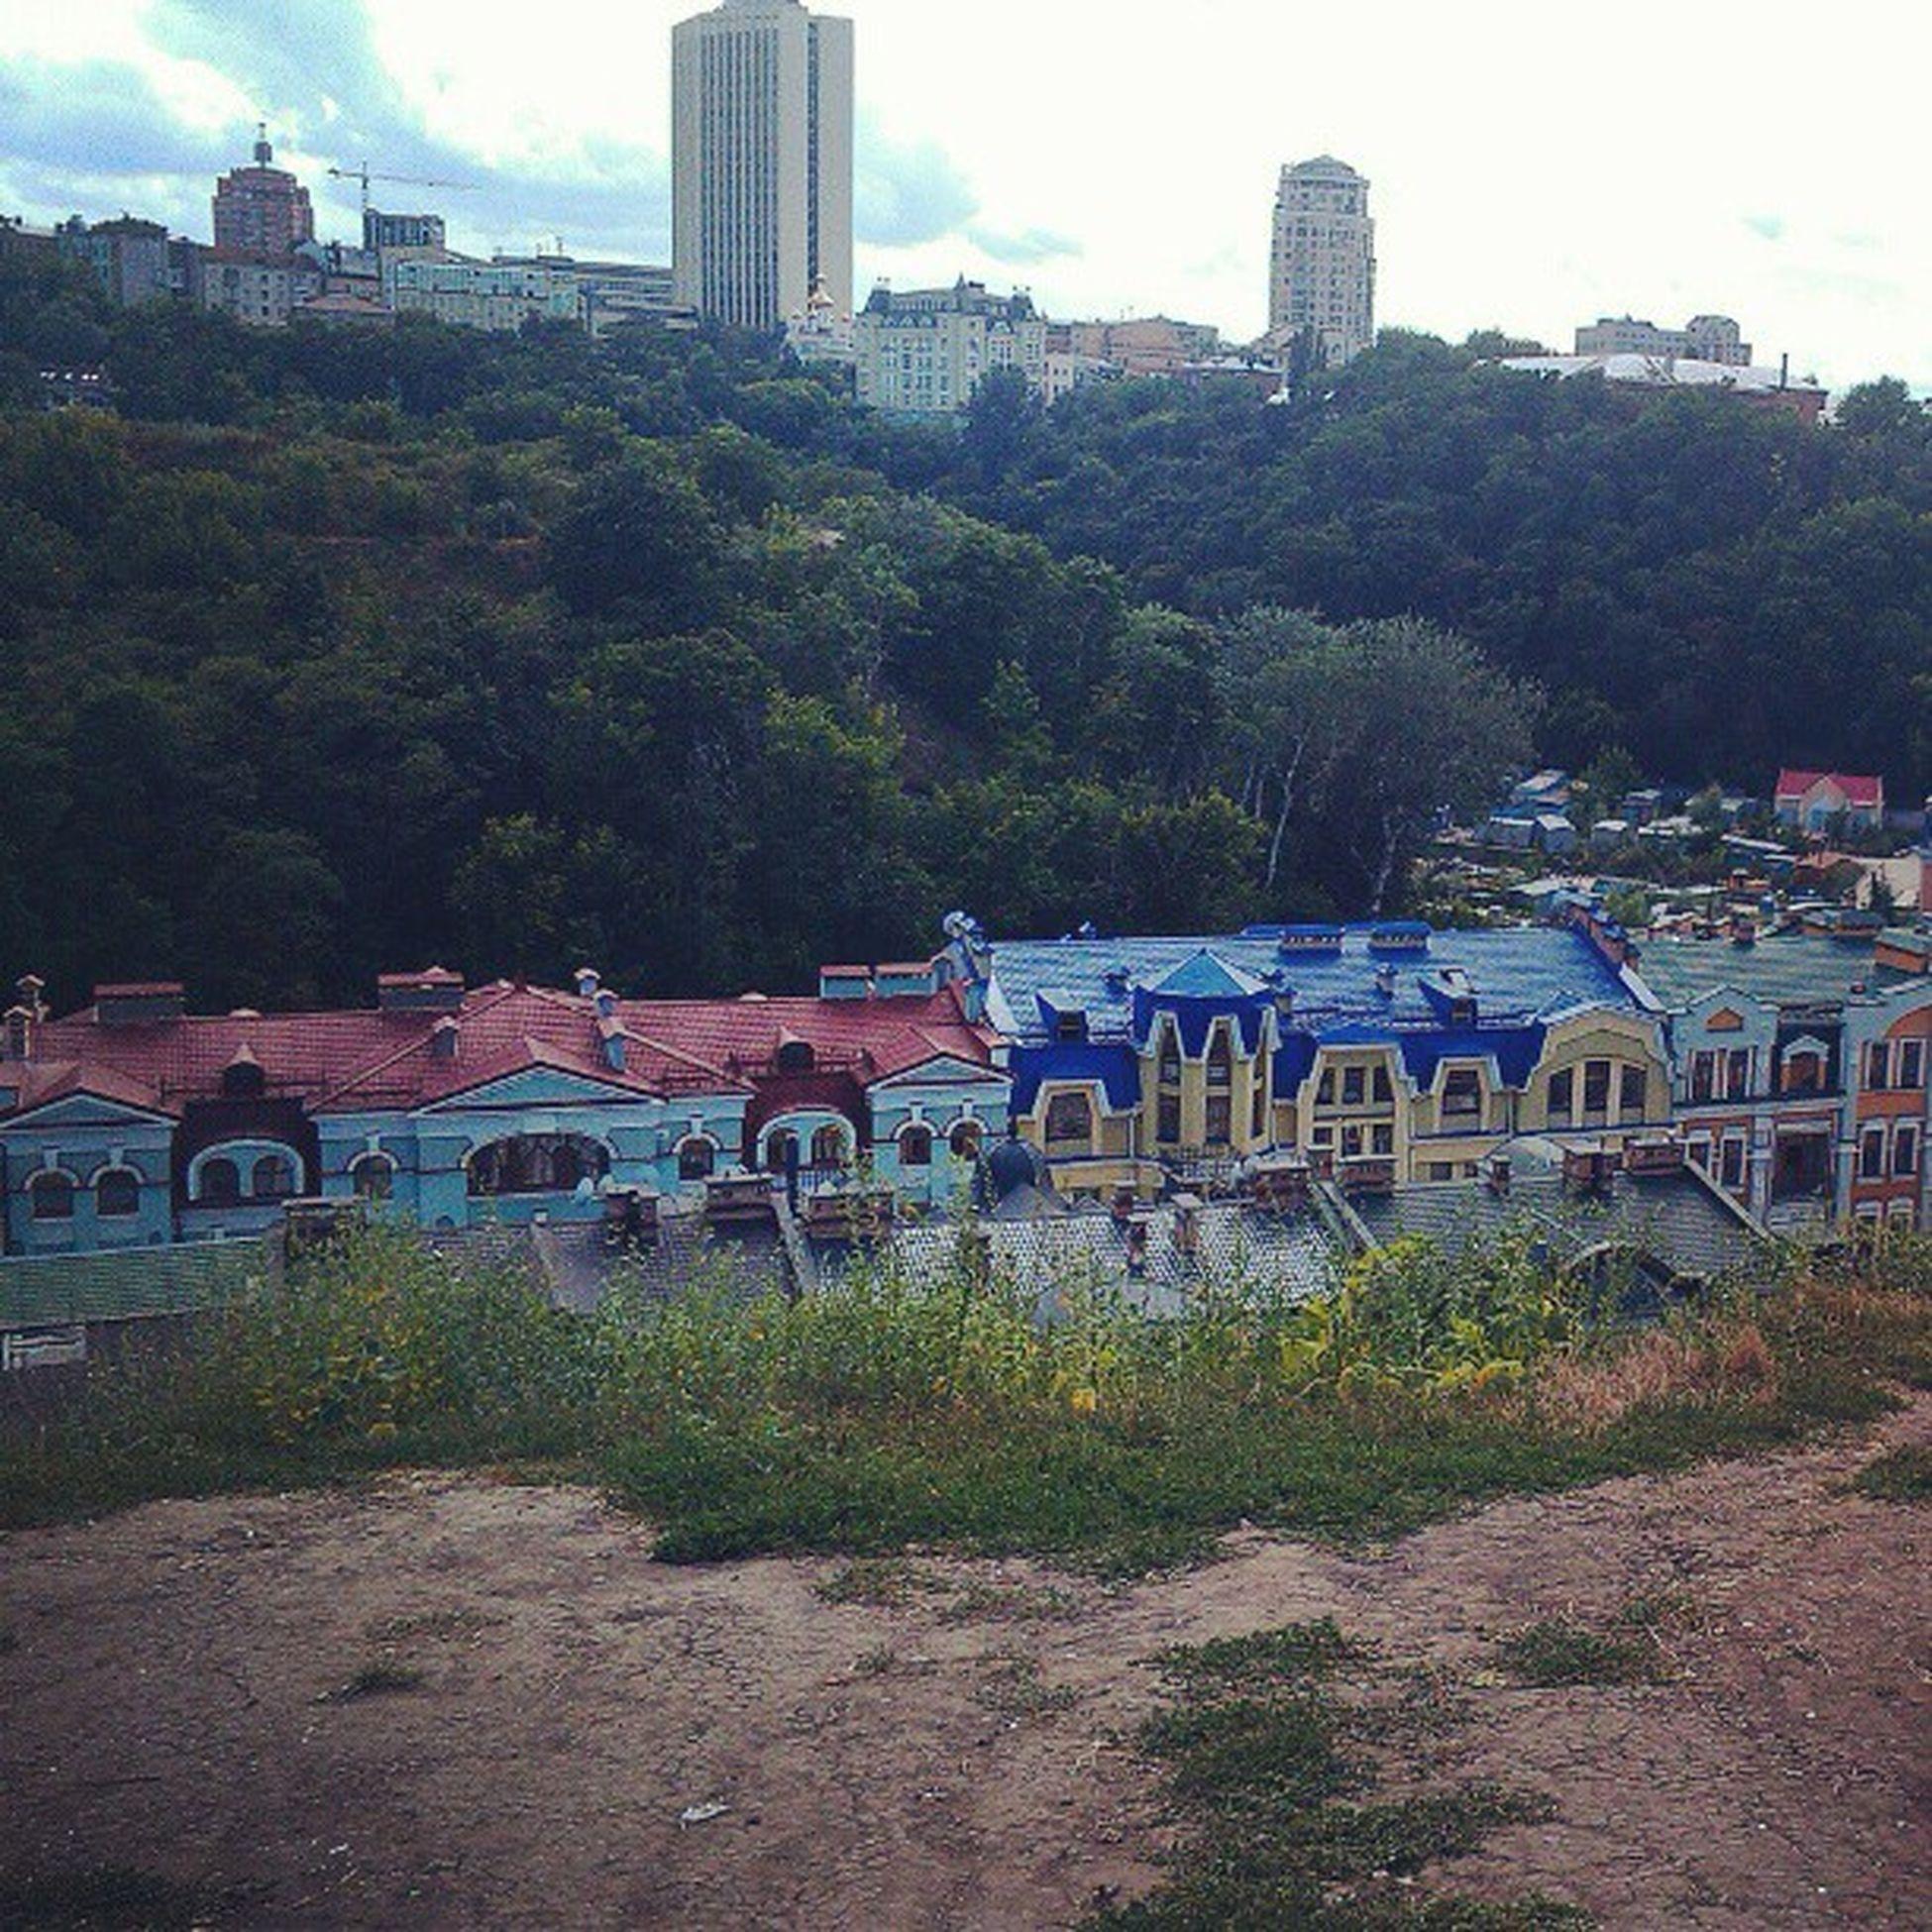 фото я Киев андреевский спуск